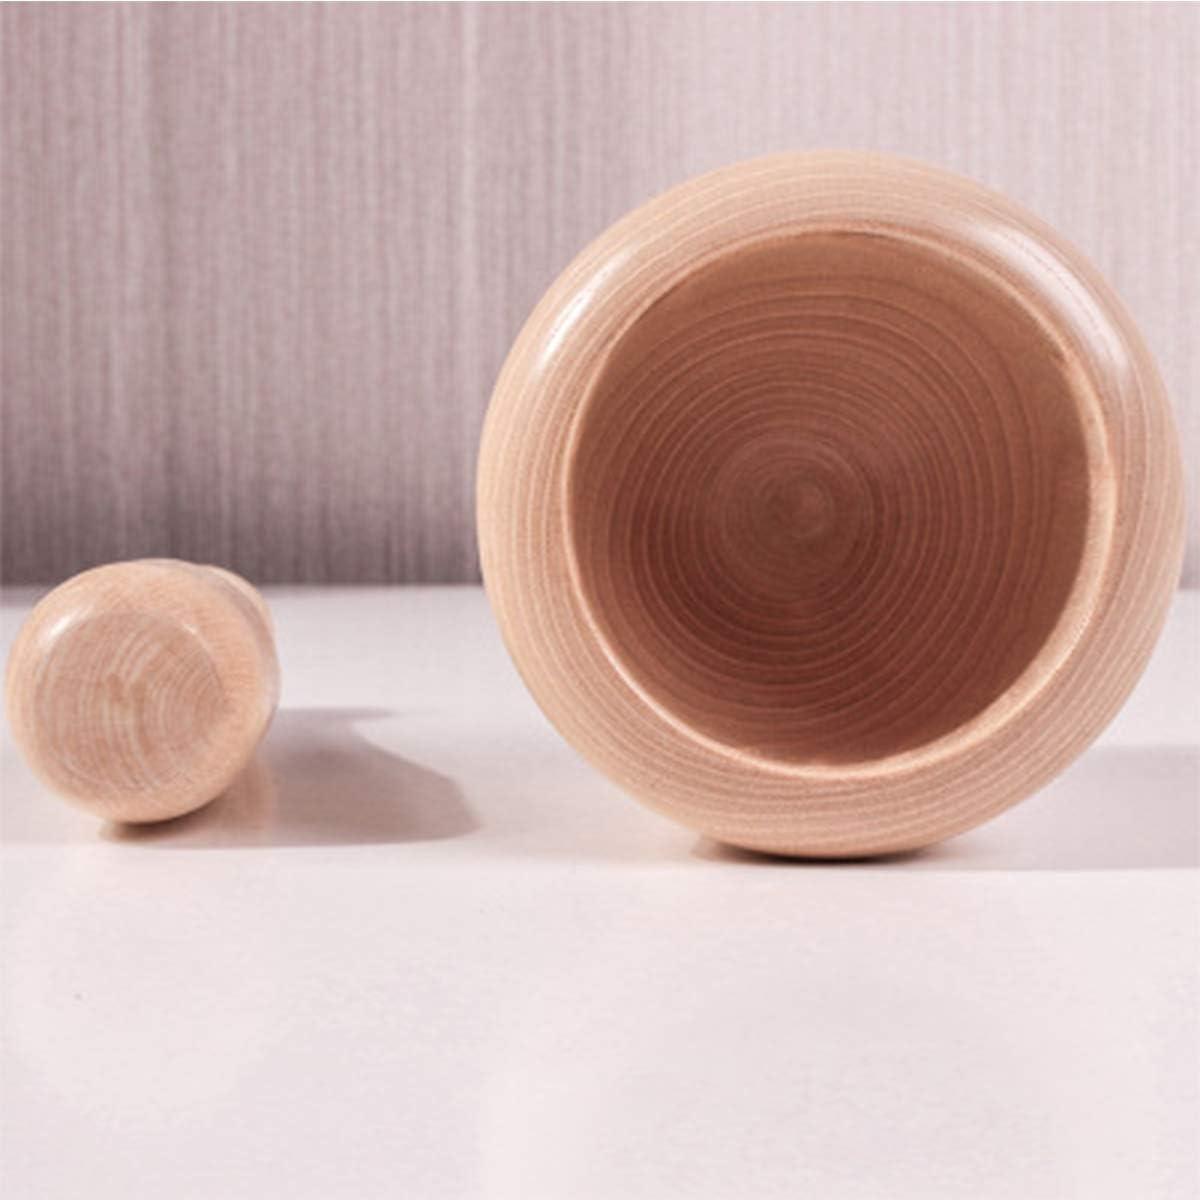 Wood Color Leoyee Household Natural Solid Wooden Manual Garlic Press Mortar and Pestle Set